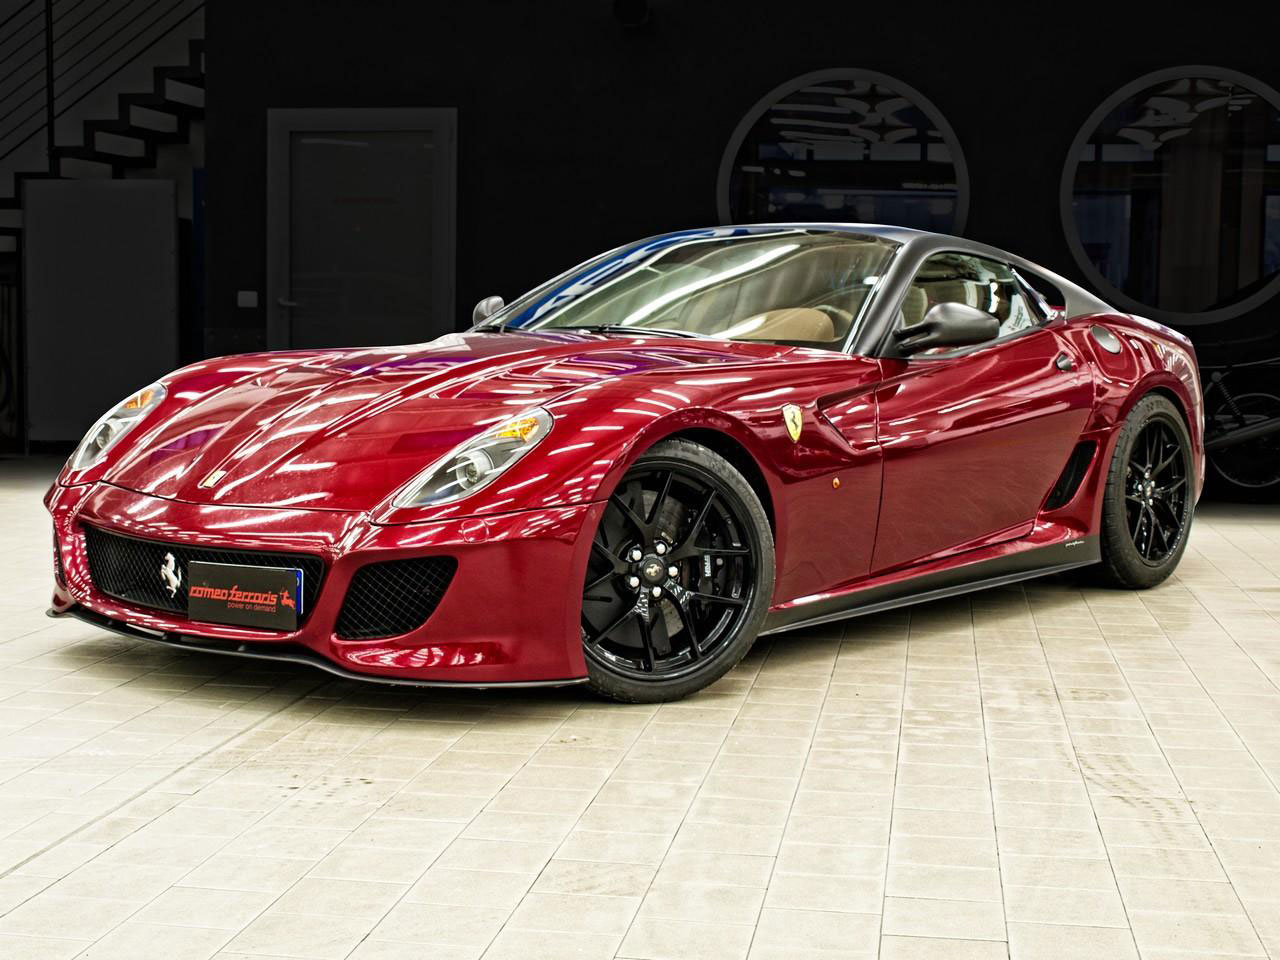 Ferrari 599 GTO má 710 koní od Romeo Ferraris 2